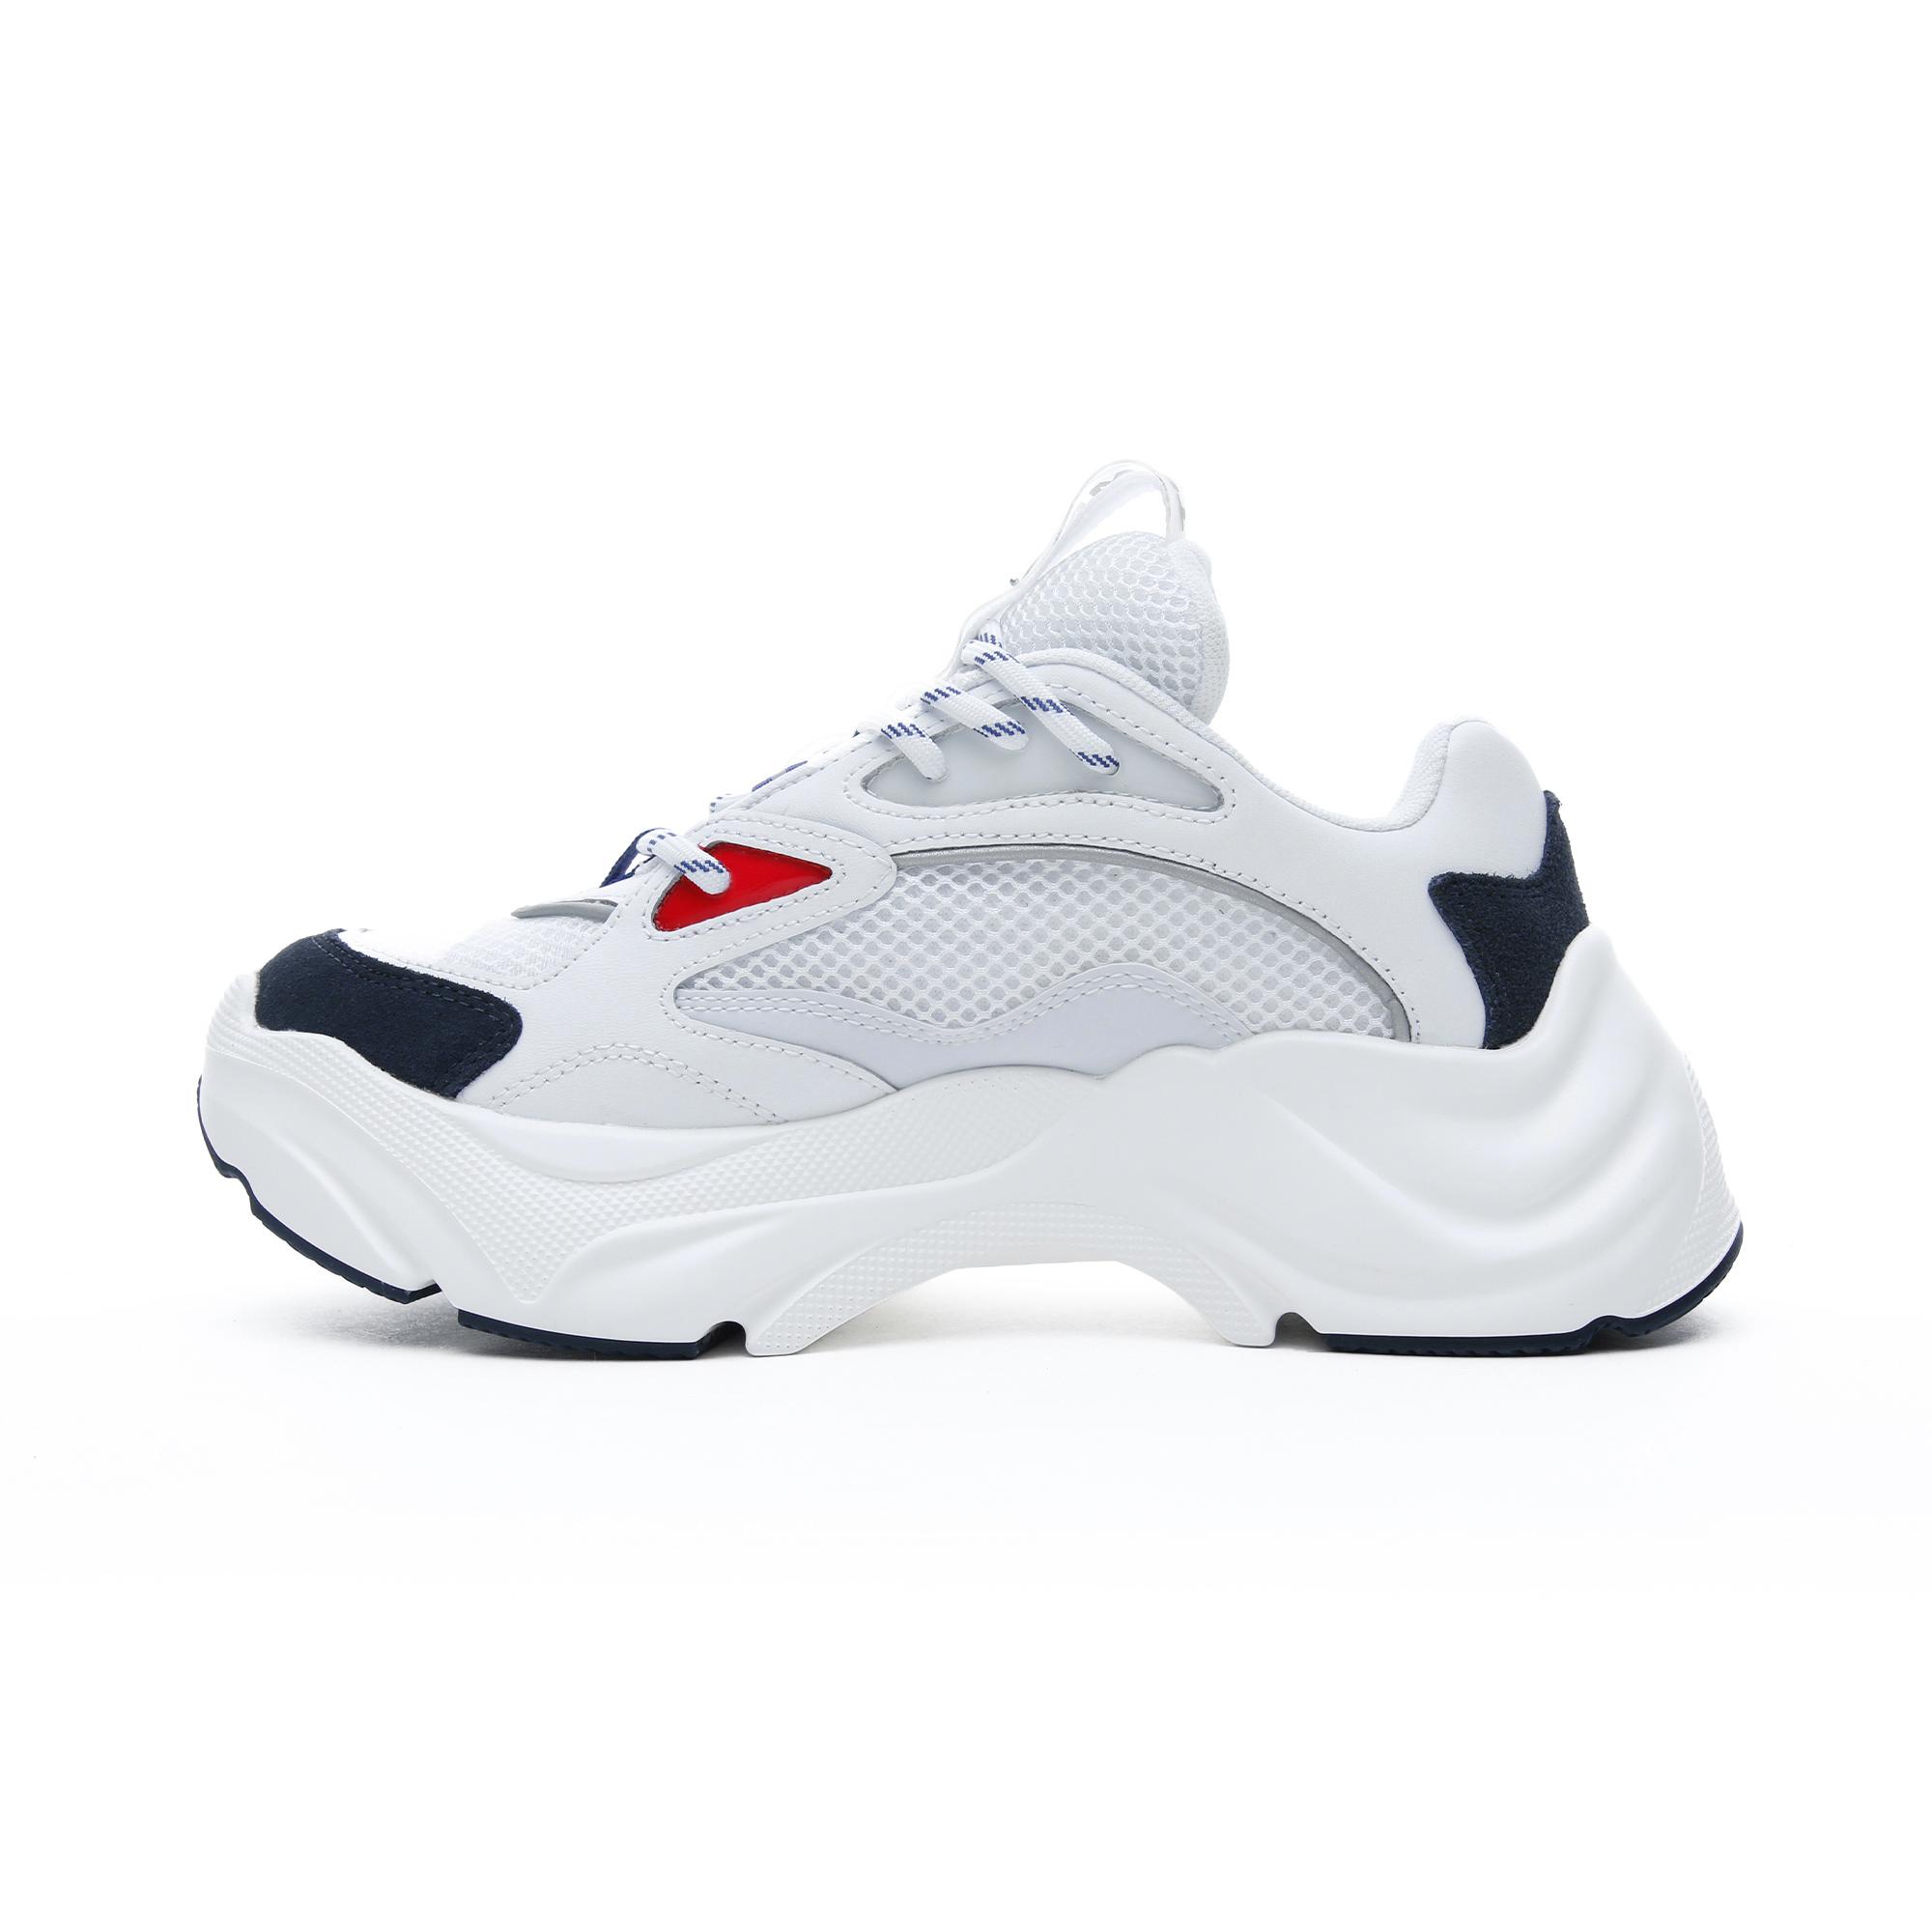 Tommy Hilfiger Fashion Chunky Kadın Beyaz Spor Ayakkabı